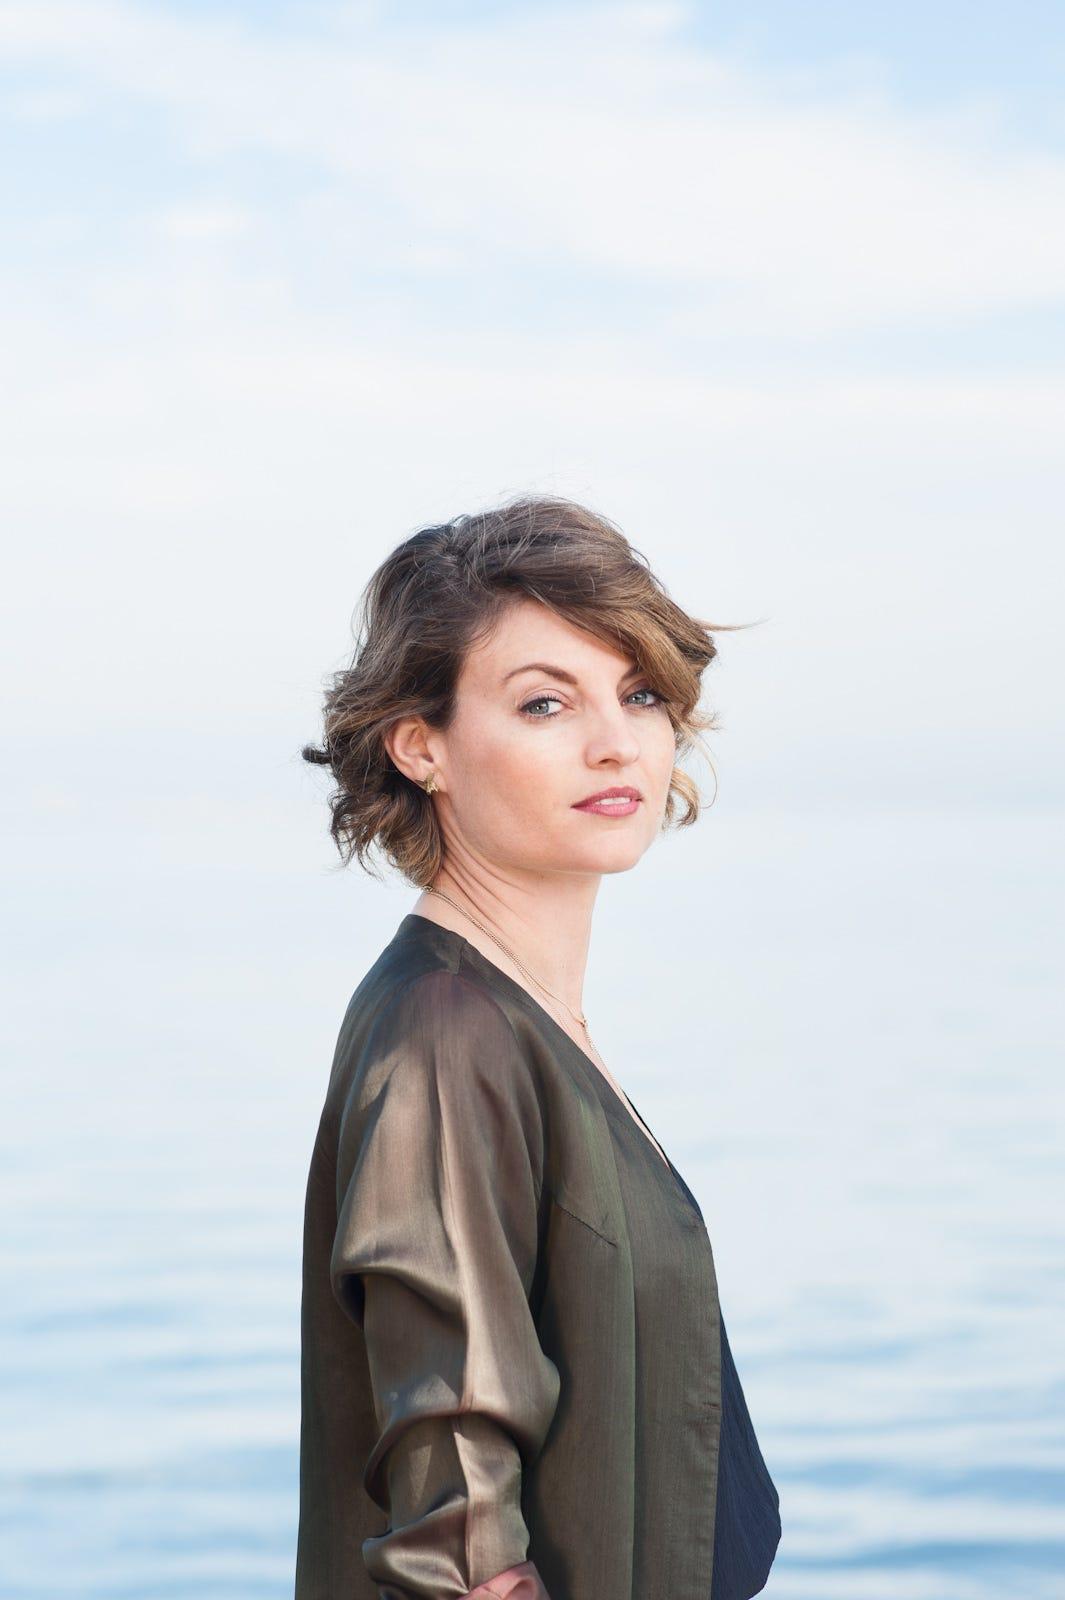 Sarah Juel Werner